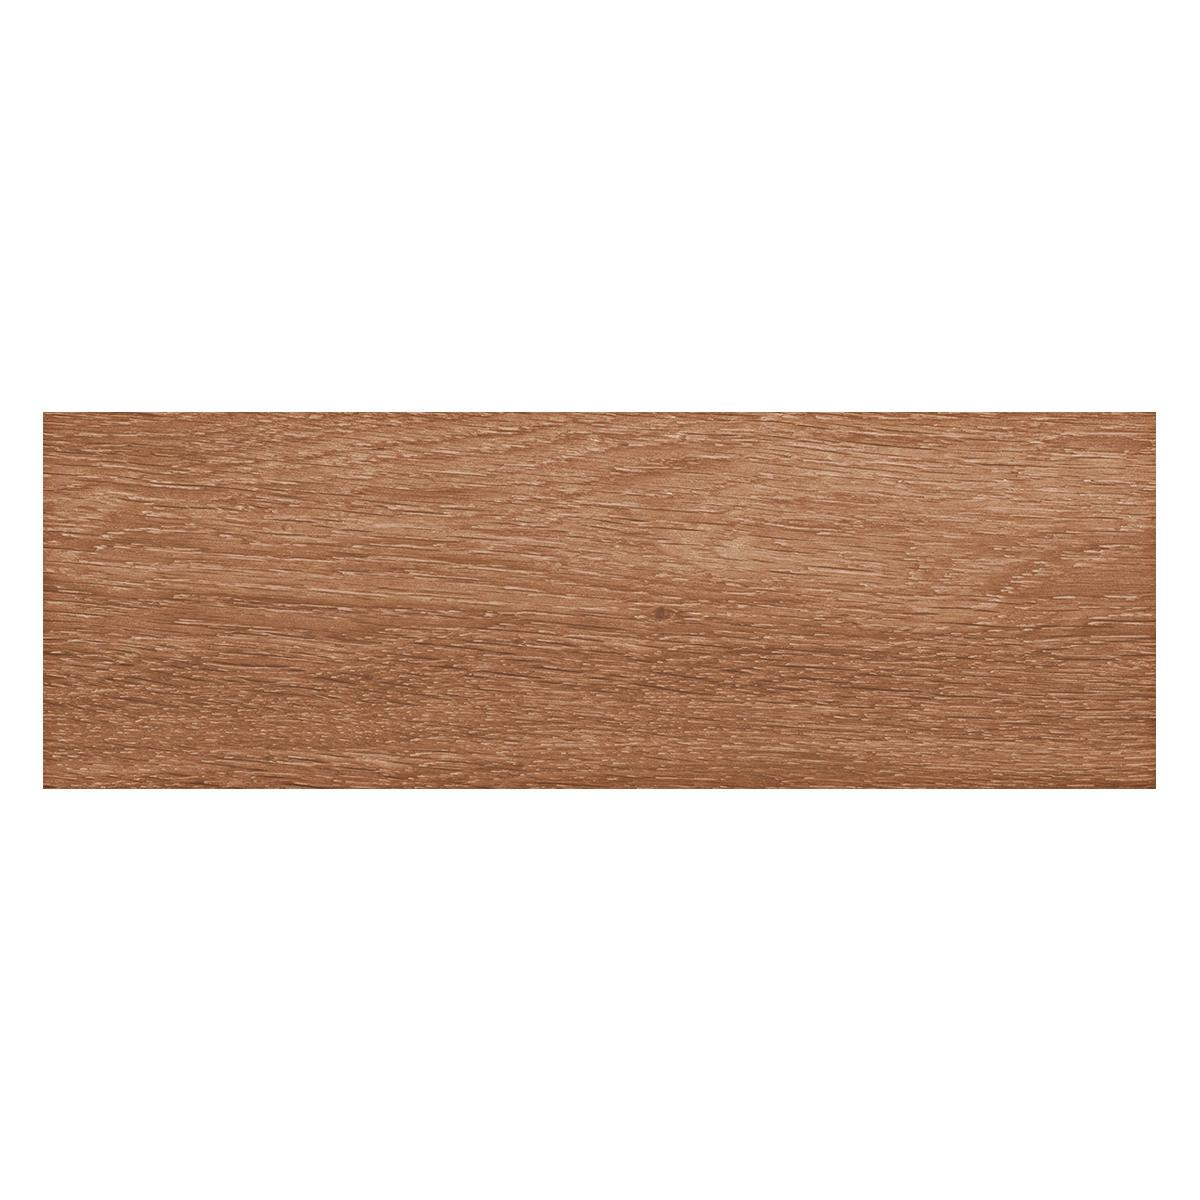 Piso Caoba Caramelo Mate - 20X60 cm - 1.44 m2